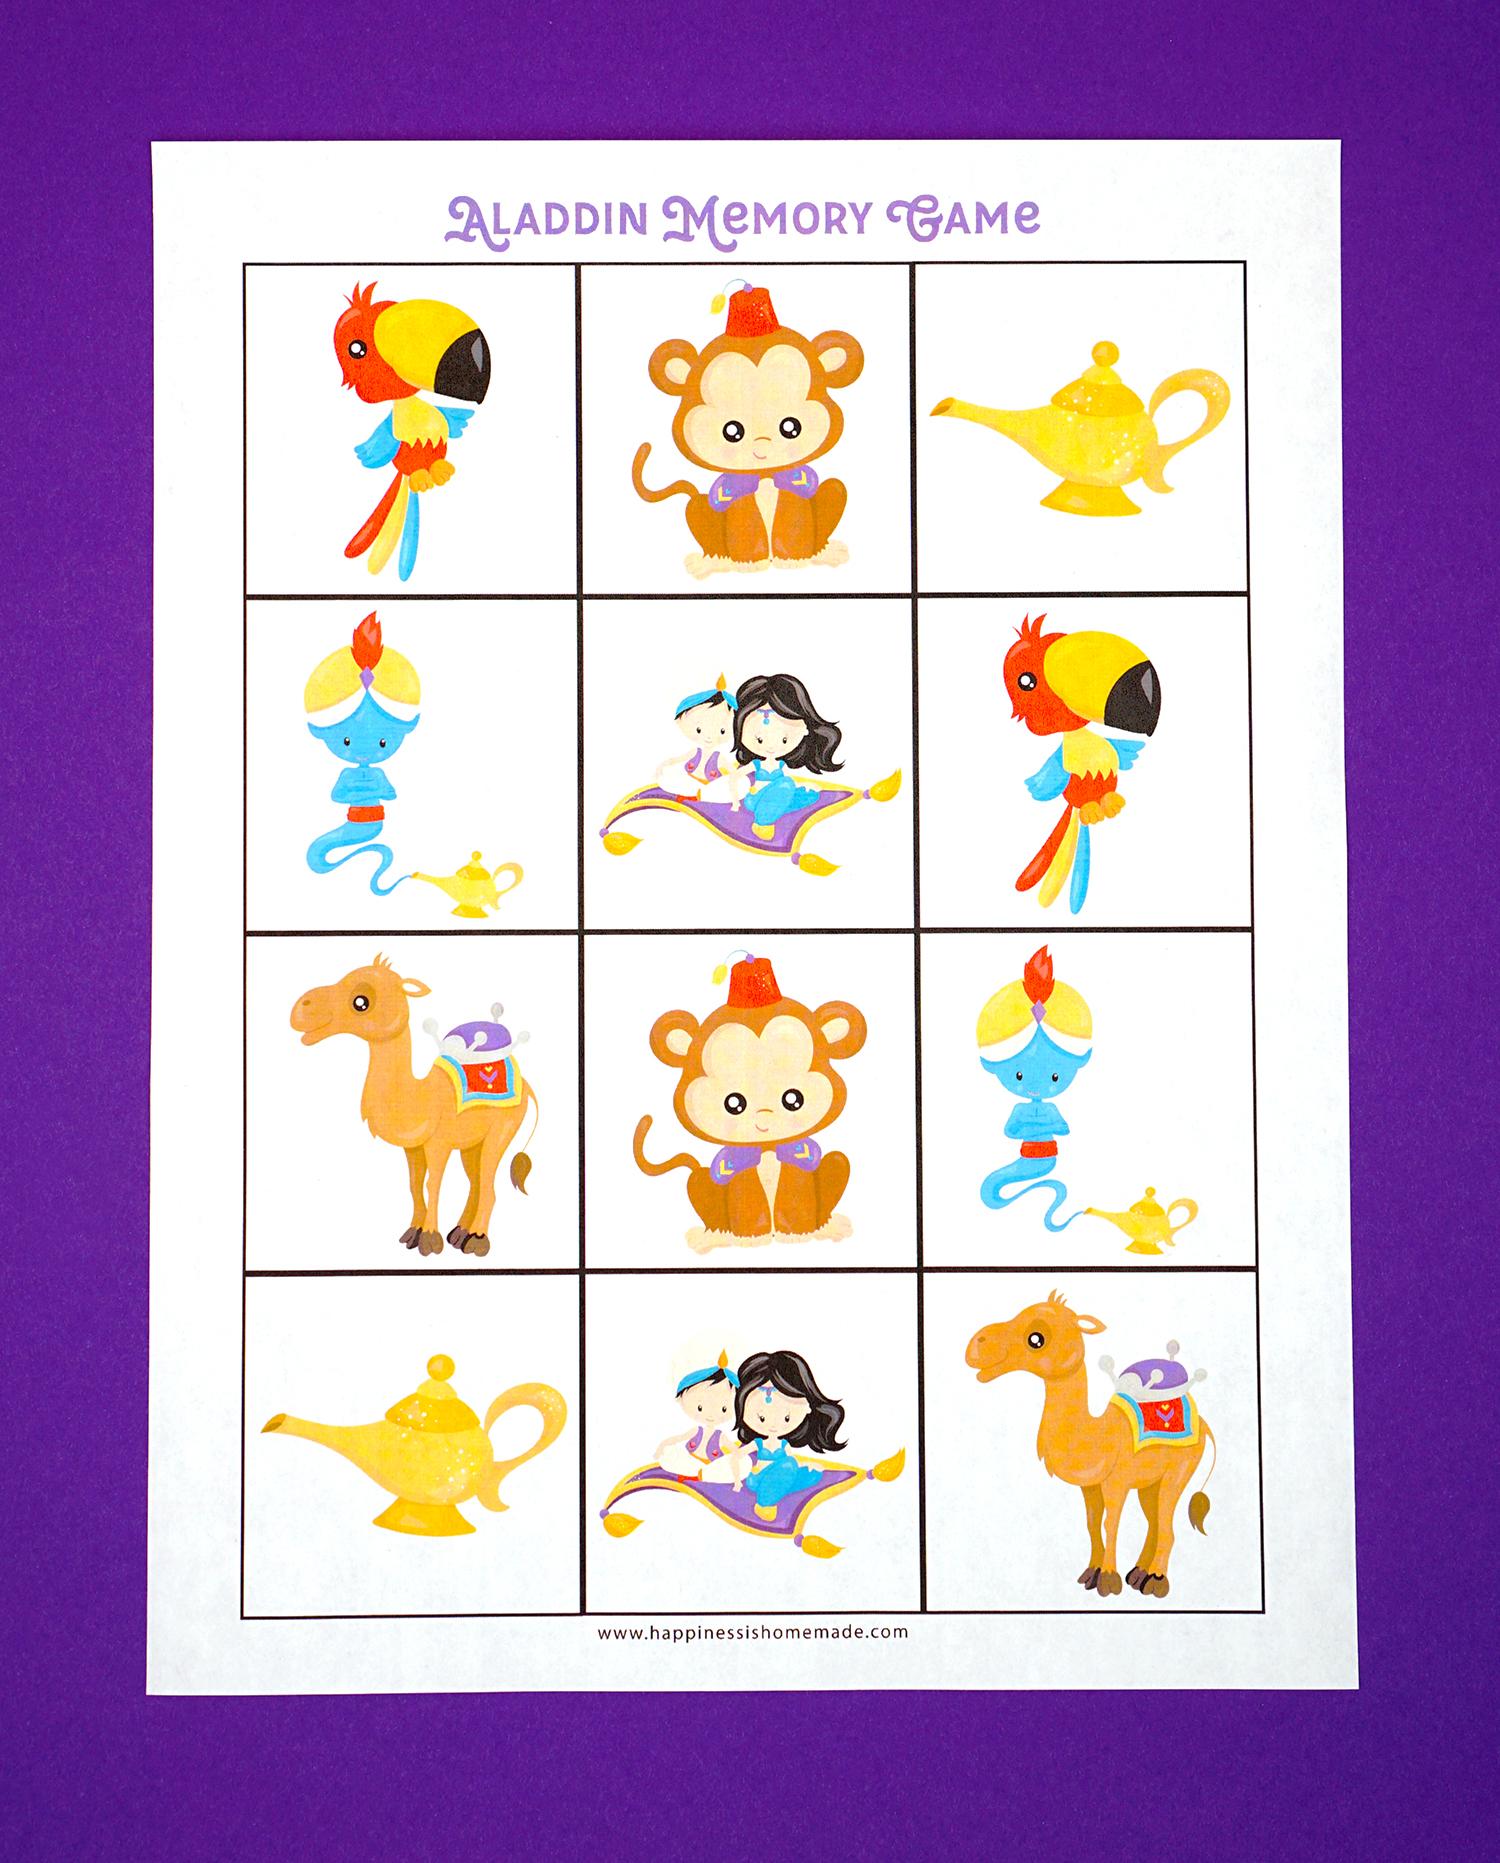 graphic regarding Preschool Memory Book Printable called Aladdin Preschool Printables - Joy is Handmade